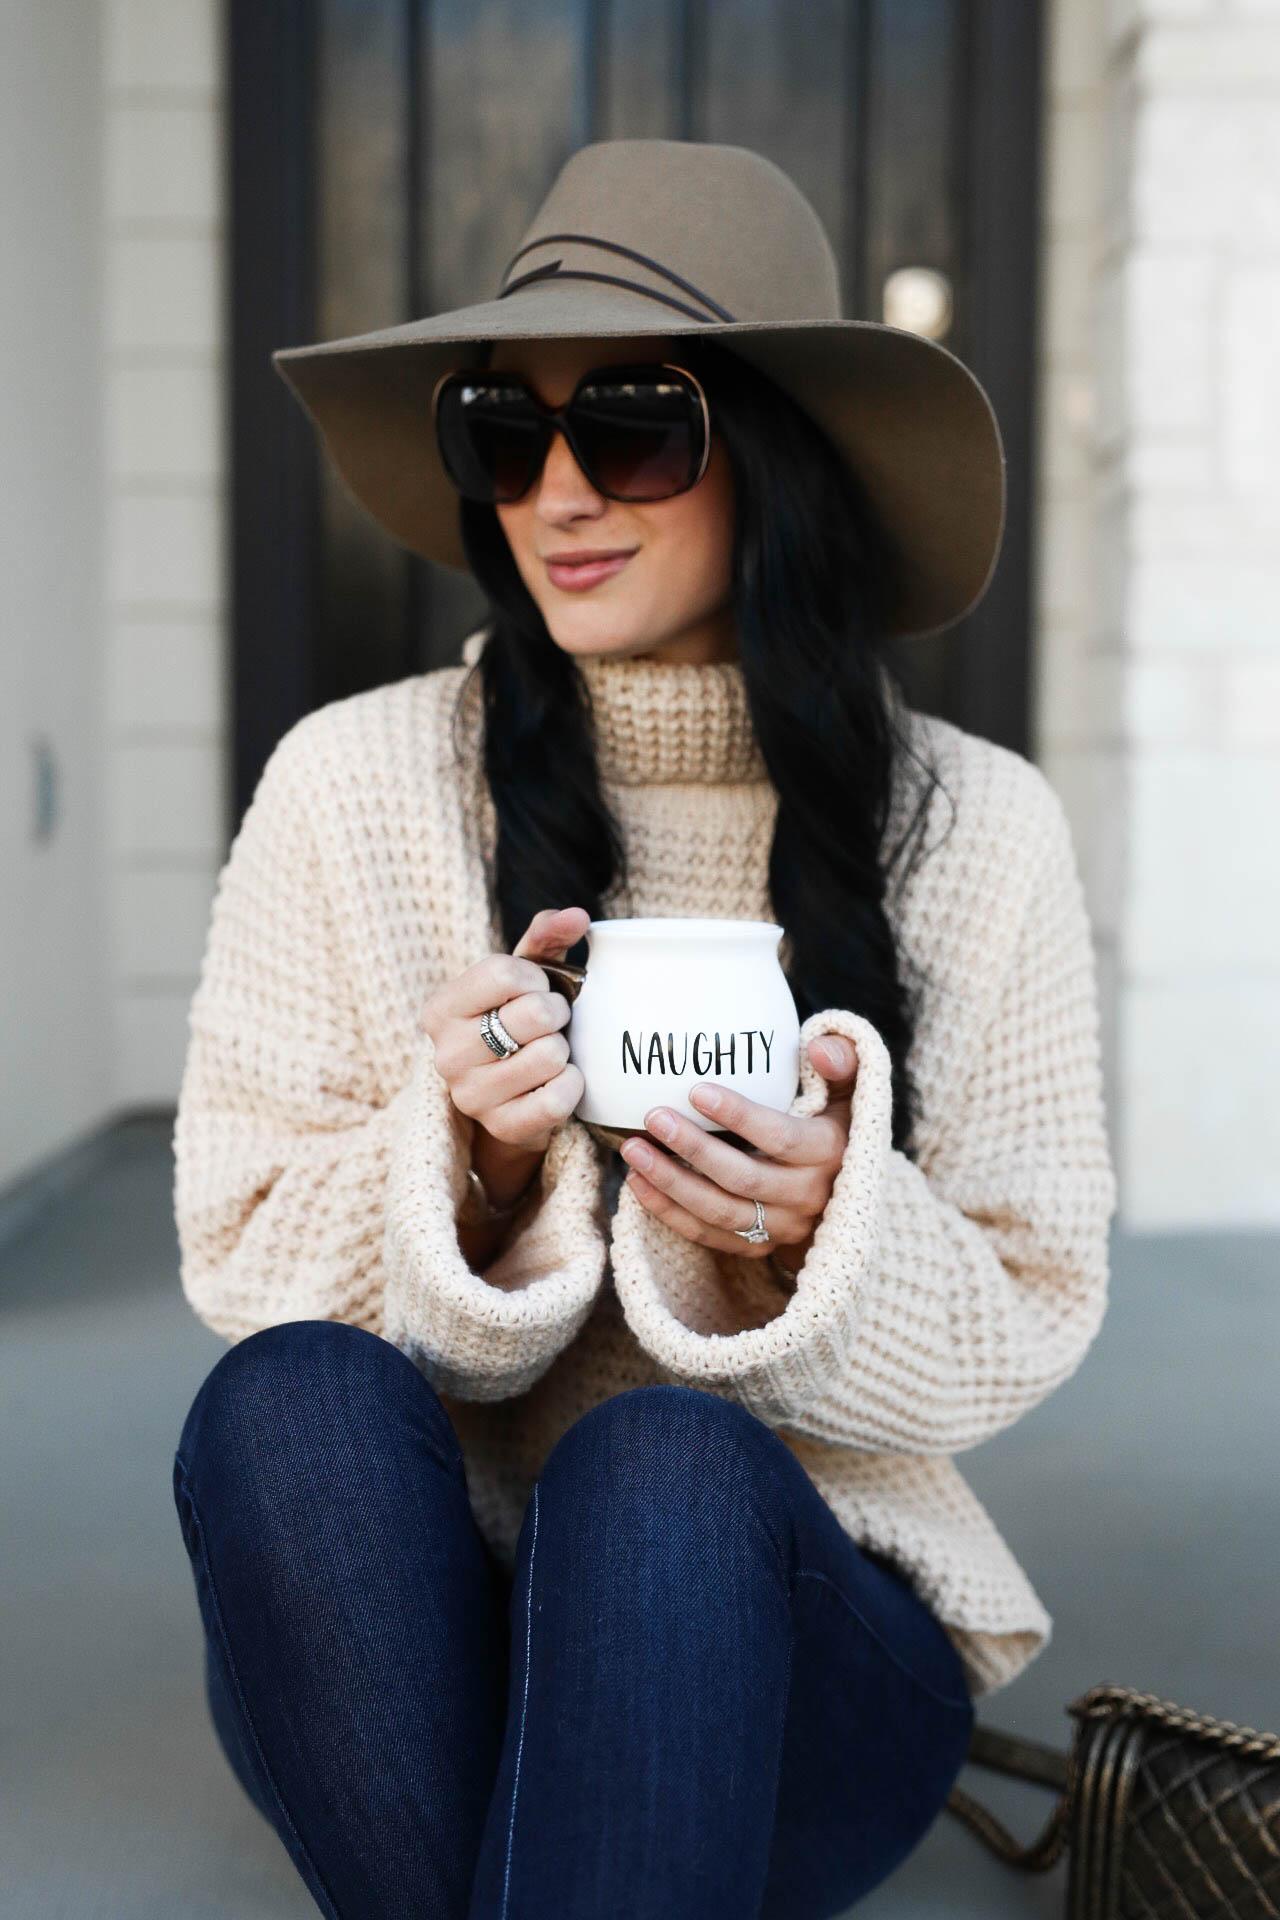 Ribbed Turtleneck Sweater, Mid Rise Skinny Jeans, Sorel Shearling Cuff Waterproof Boots, Chanel Handbag, Felt Hat | how to style a winter sweater | sweater style tips | sweaters for winter | affordable winter sweaters | winter style tips | what to wear for winter | cool weather fashion | fashion for winter | style tips for winter | outfit ideas for winter || Dressed to Kil #sweaterweather #sweatersforwomen #sweaters - Sweater Weather with Goodnight Macaroon by Austin fashion blogger Dressed to Kill